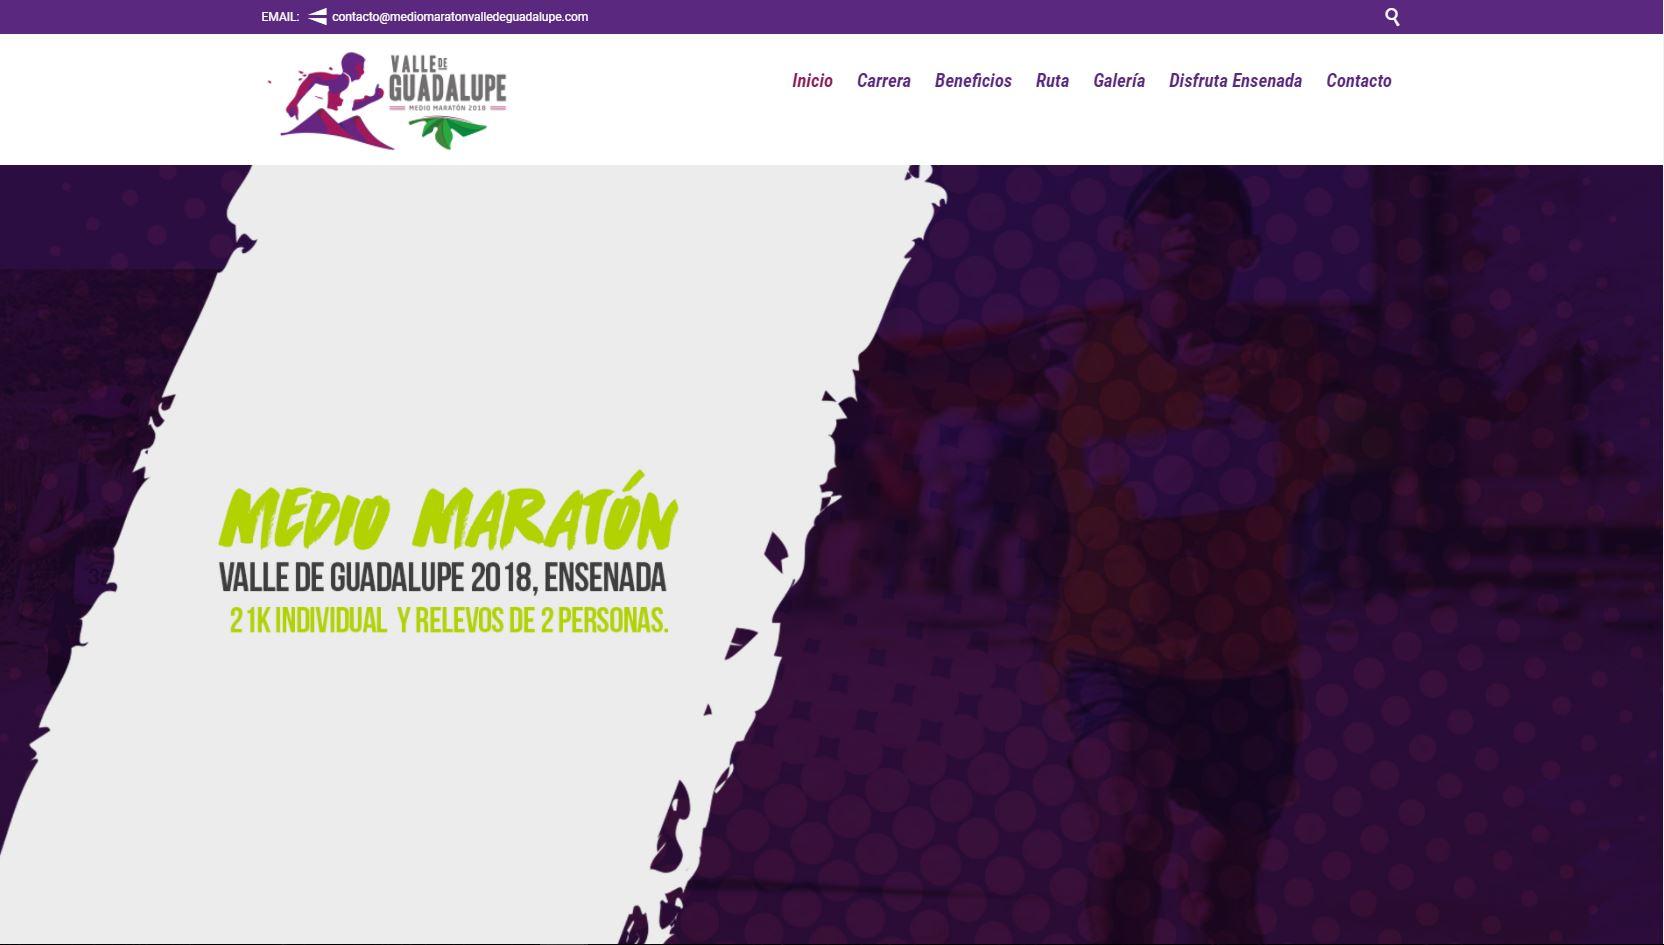 Medio Maratón Valle de Guadalupe